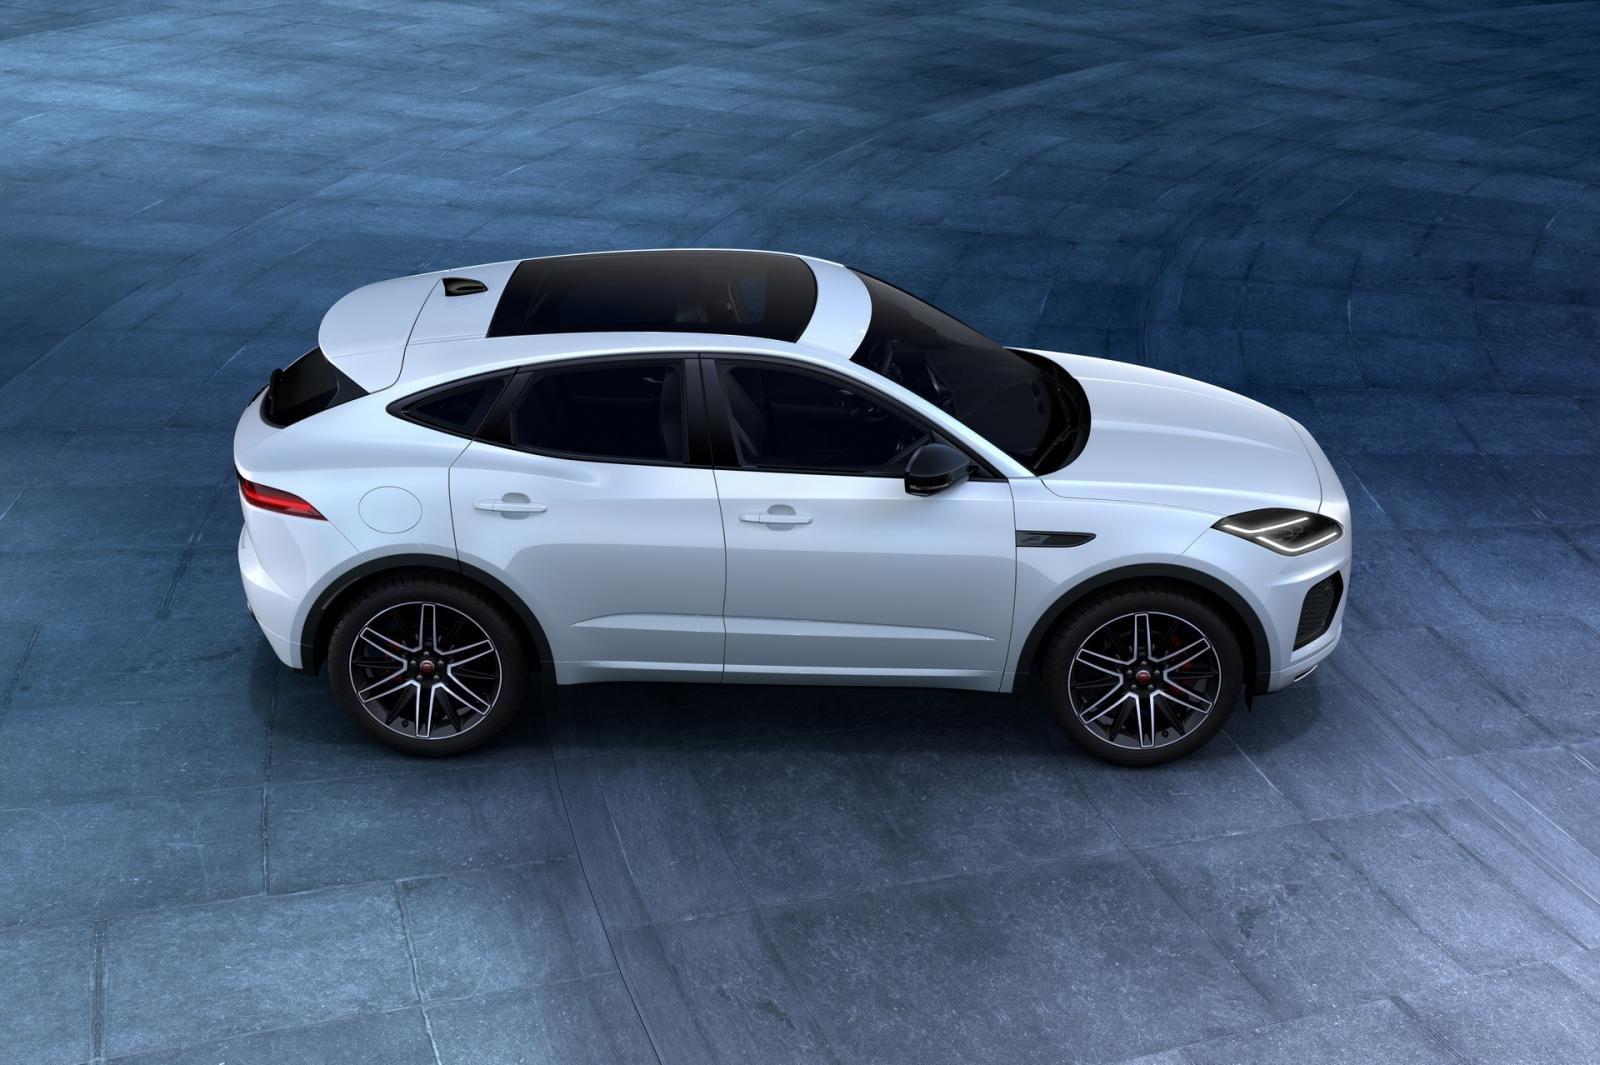 Jaguar E-Pace 2021 R-Dynamic Black Edition cực kỳ hấp dẫn.